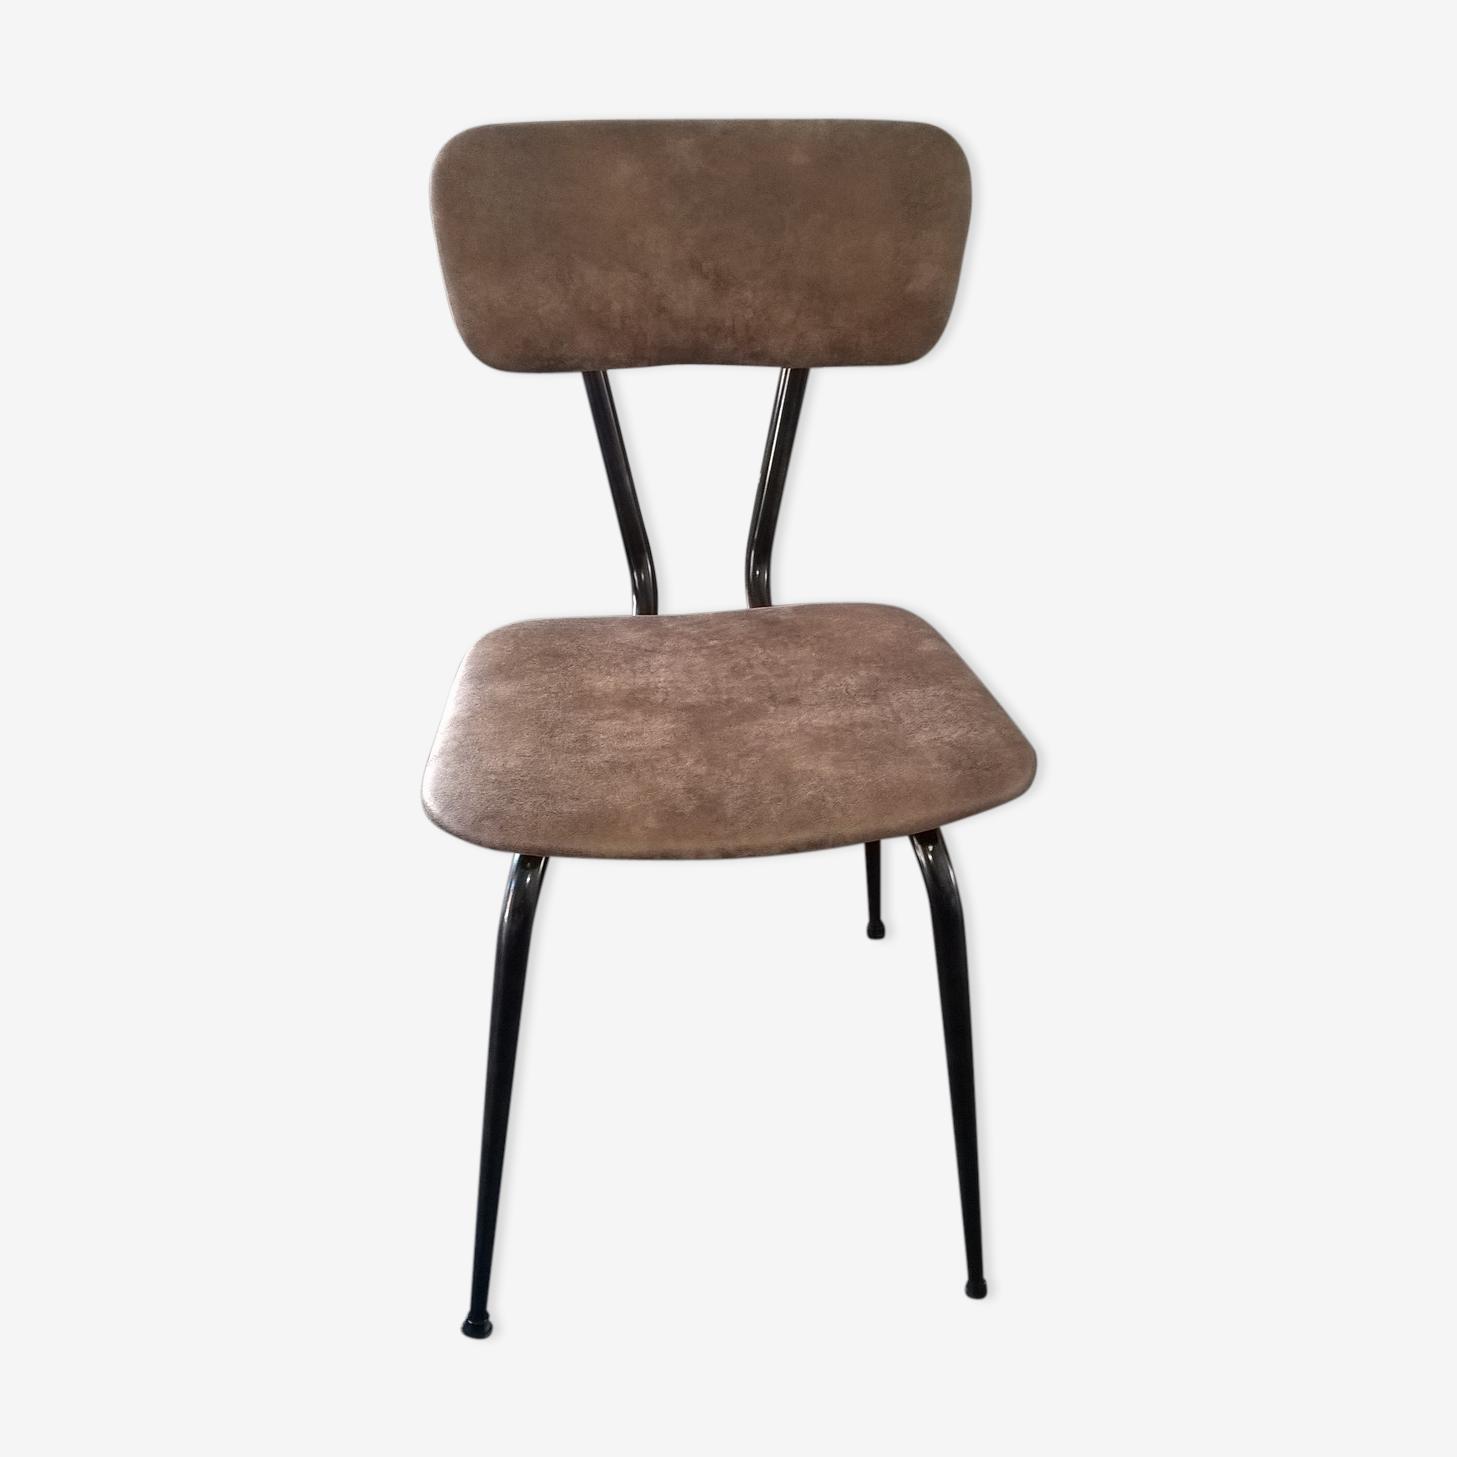 Industrial chair